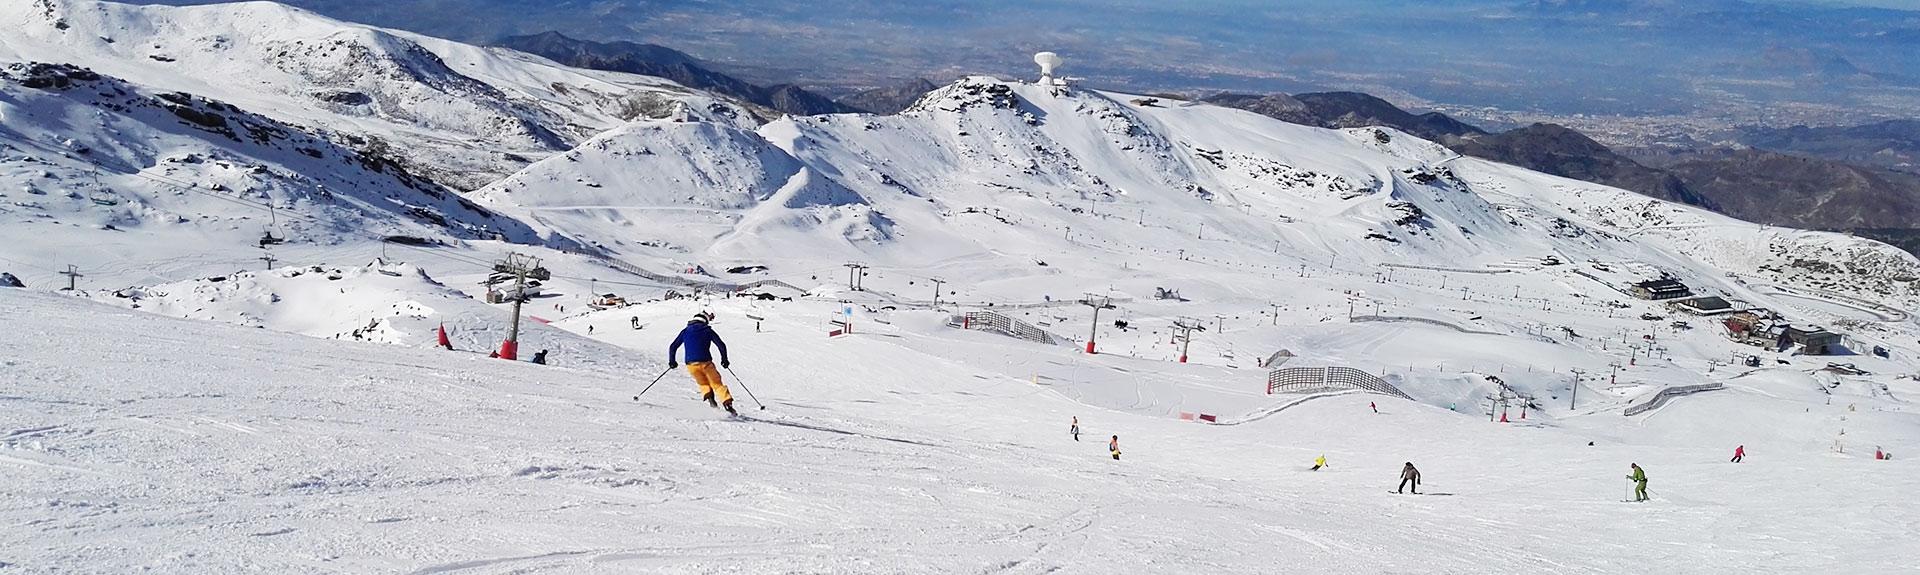 sierra-nevada-grande